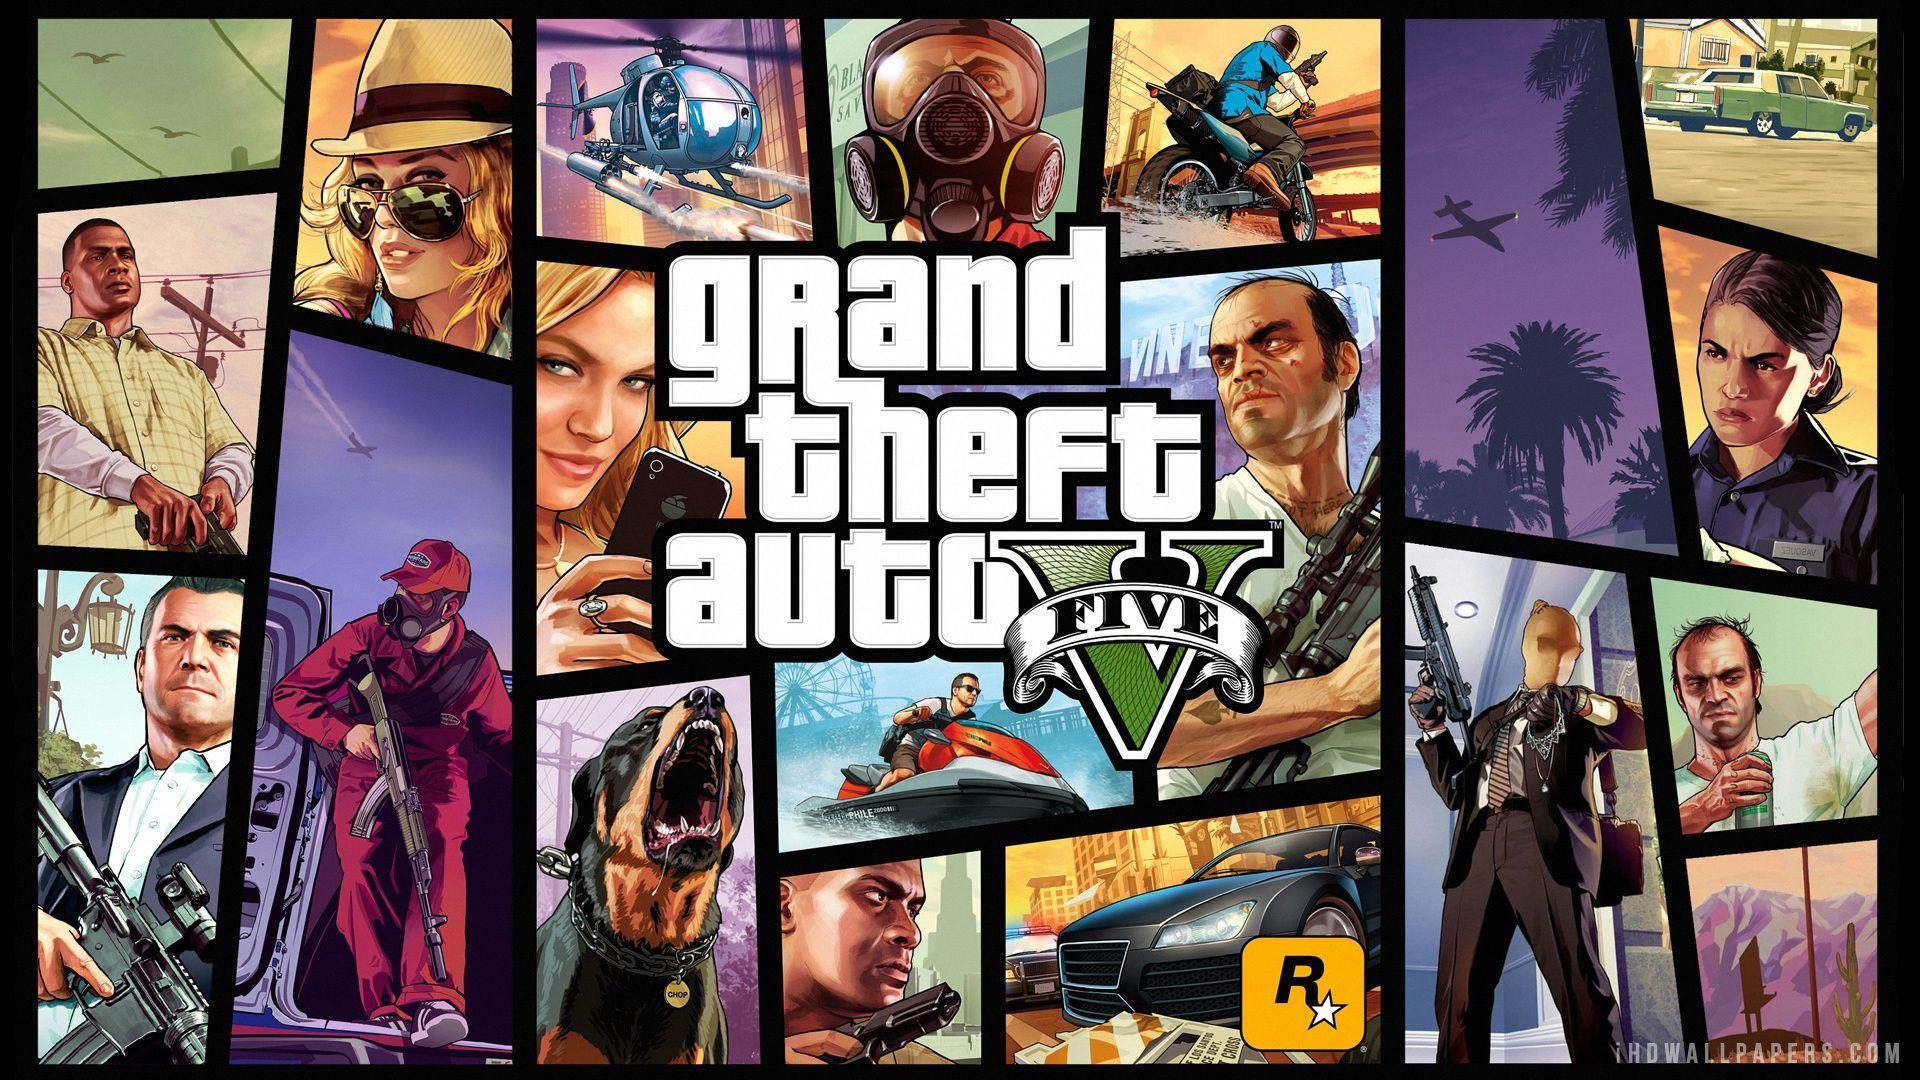 Grand Theft Auto filmi geliyor